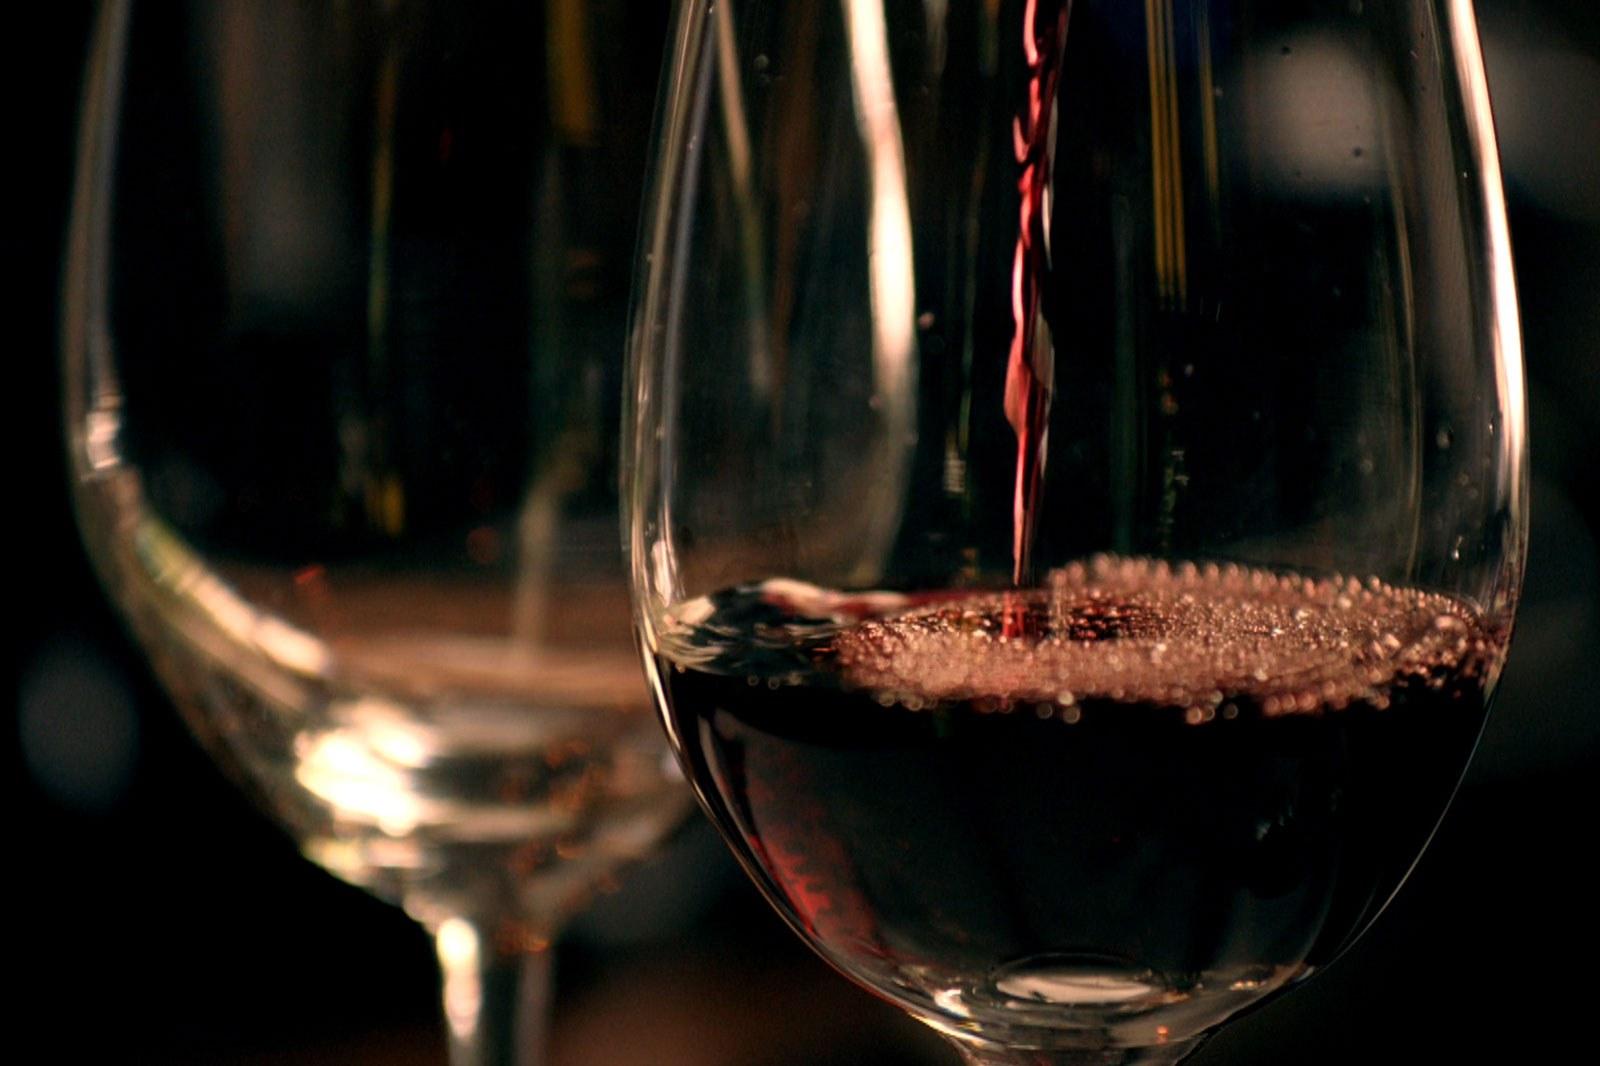 The wine show 4